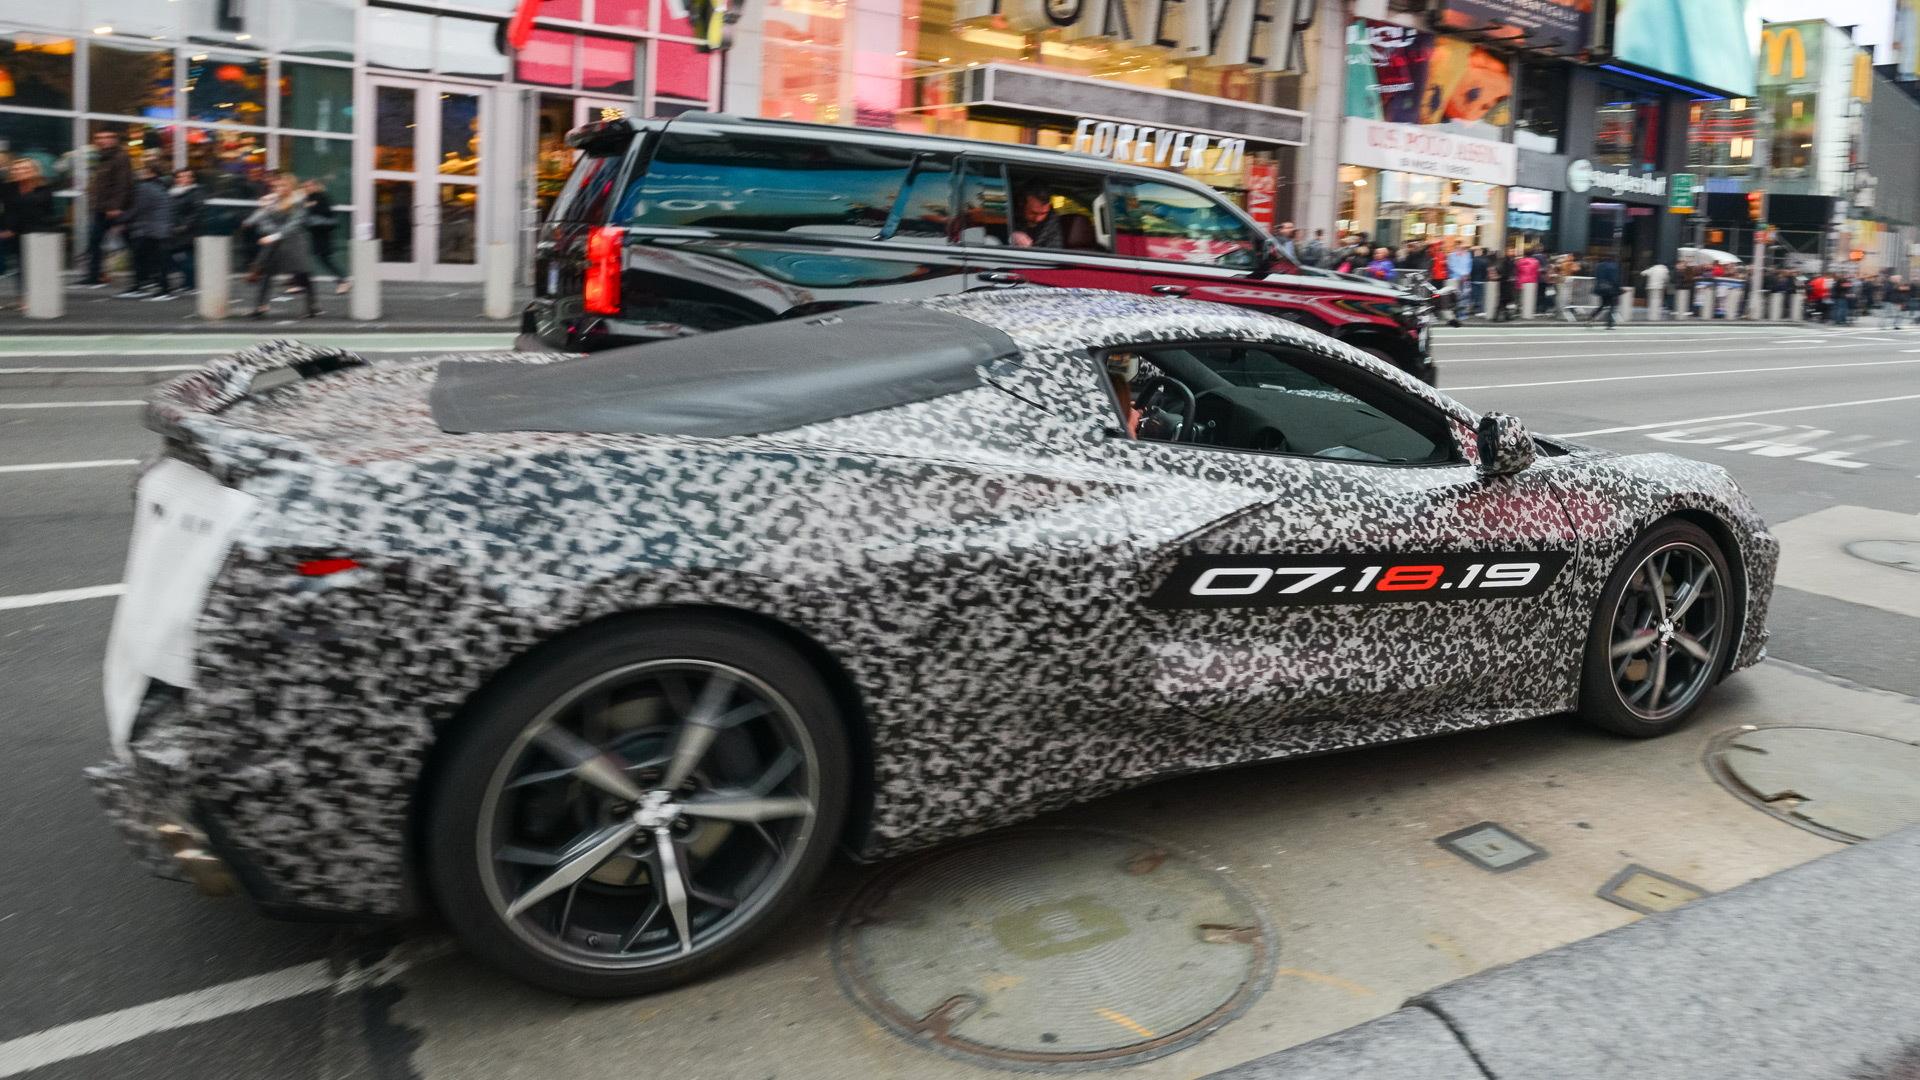 Chevrolet Corvette News - Breaking News, Photos & Videos - Motor Authority